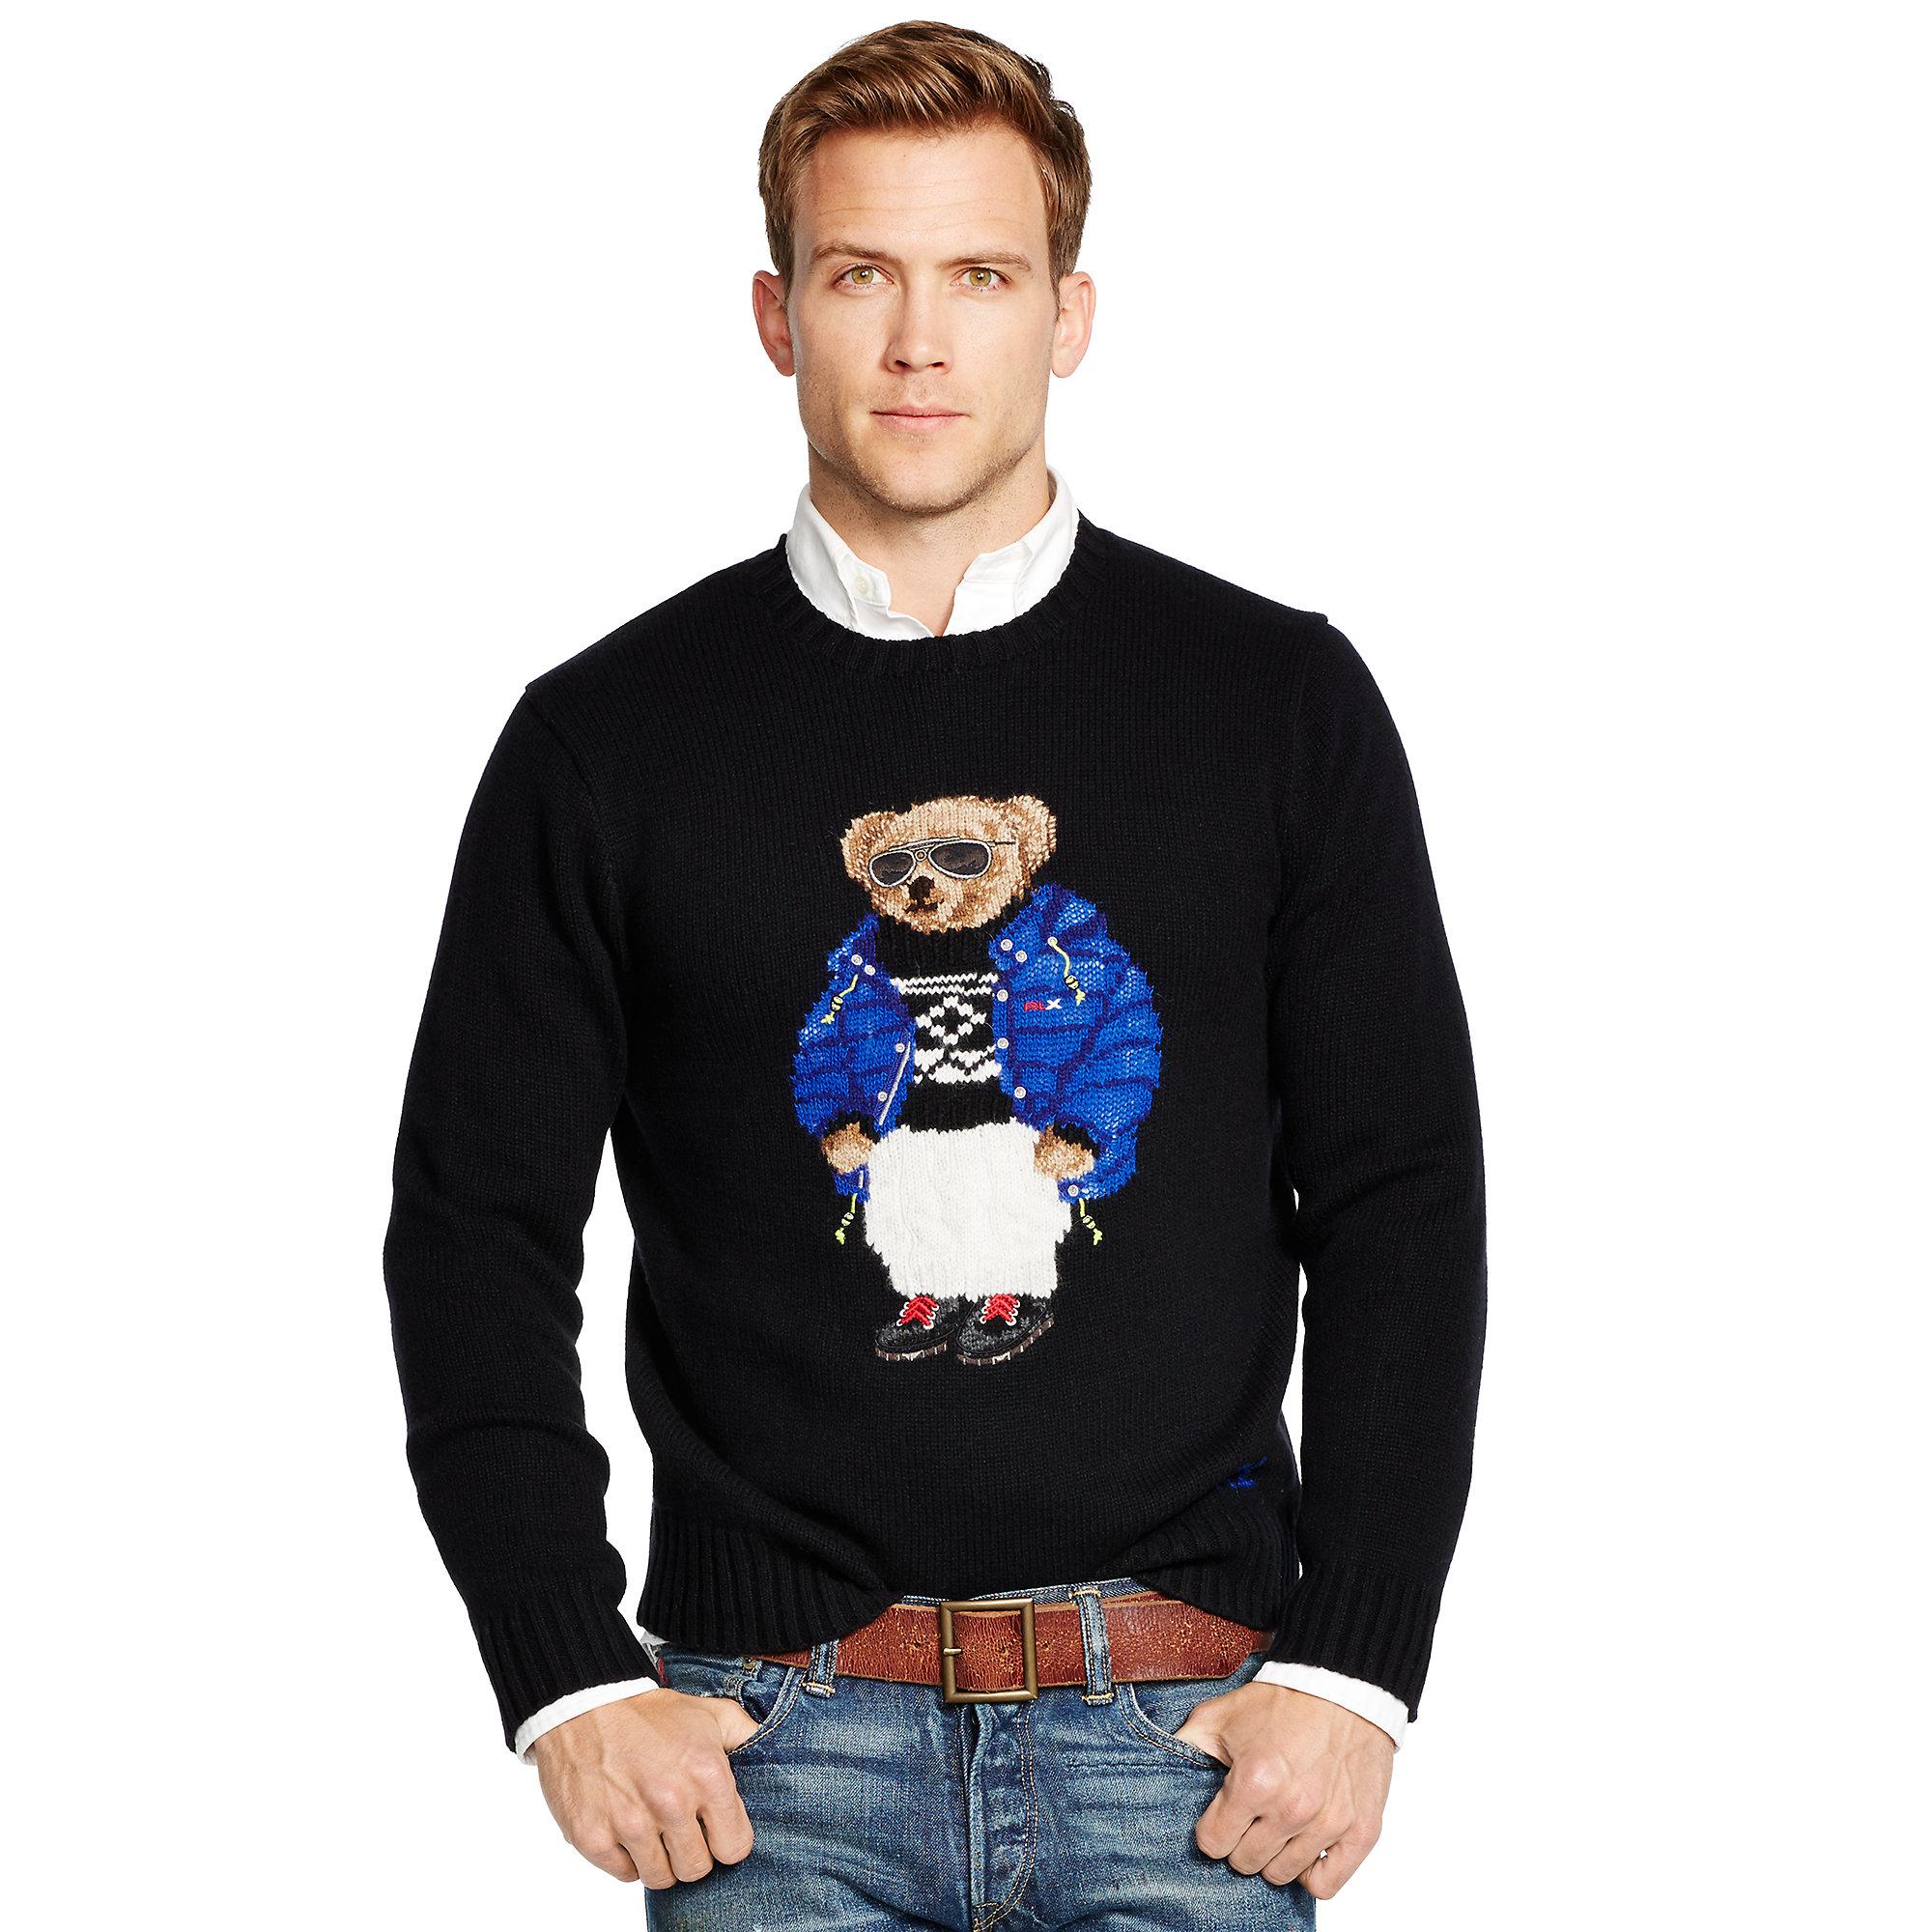 bd111abe20a5d Lyst - Polo Ralph Lauren Ski Polo Bear Sweater in Black for Men